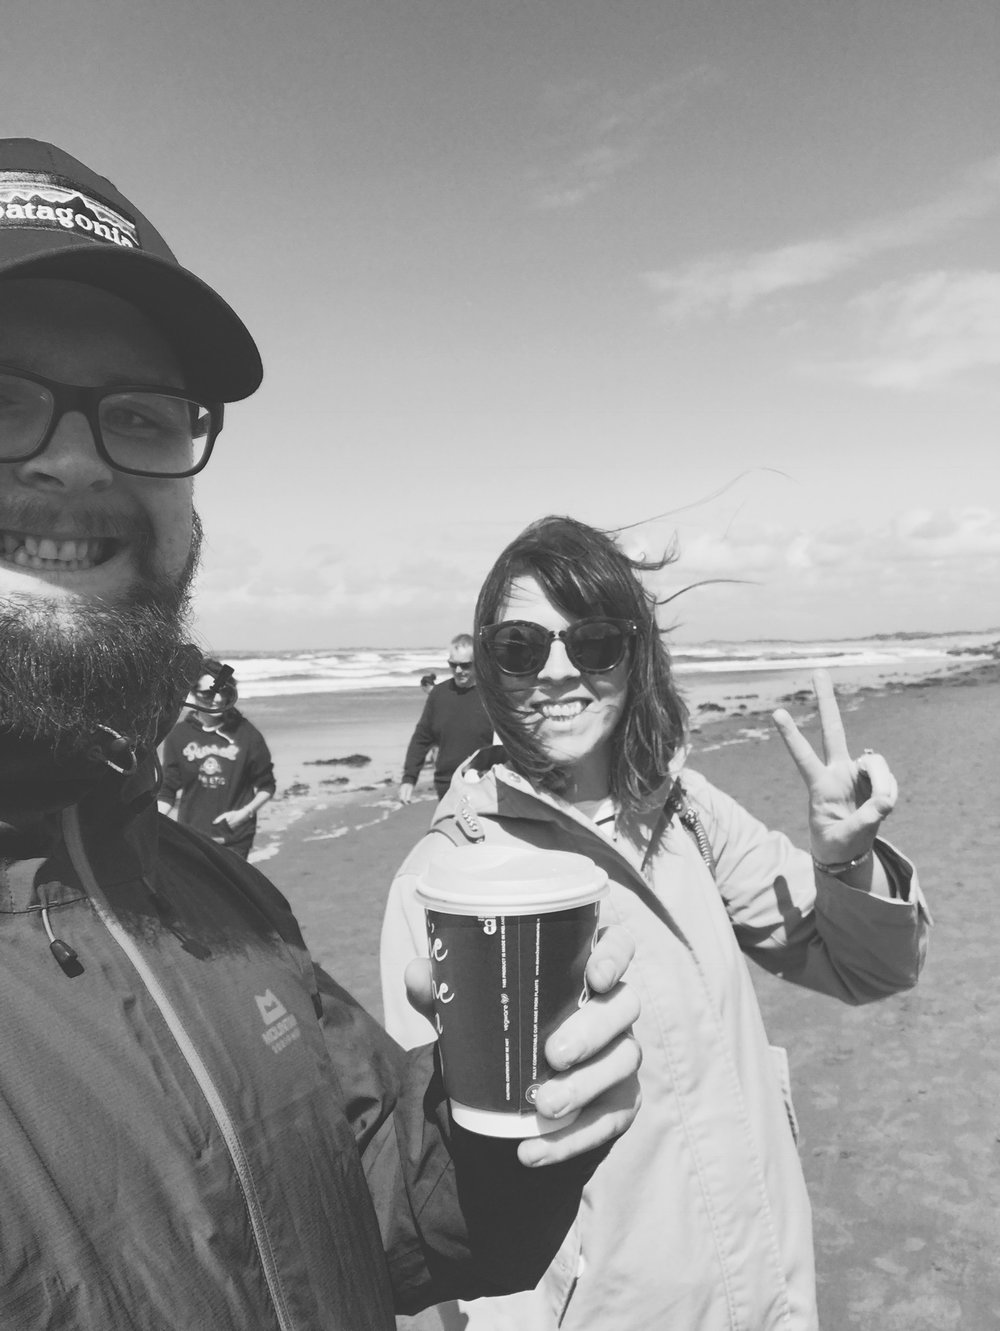 Bro-in-law @ianvennard selfie @ Strandhill